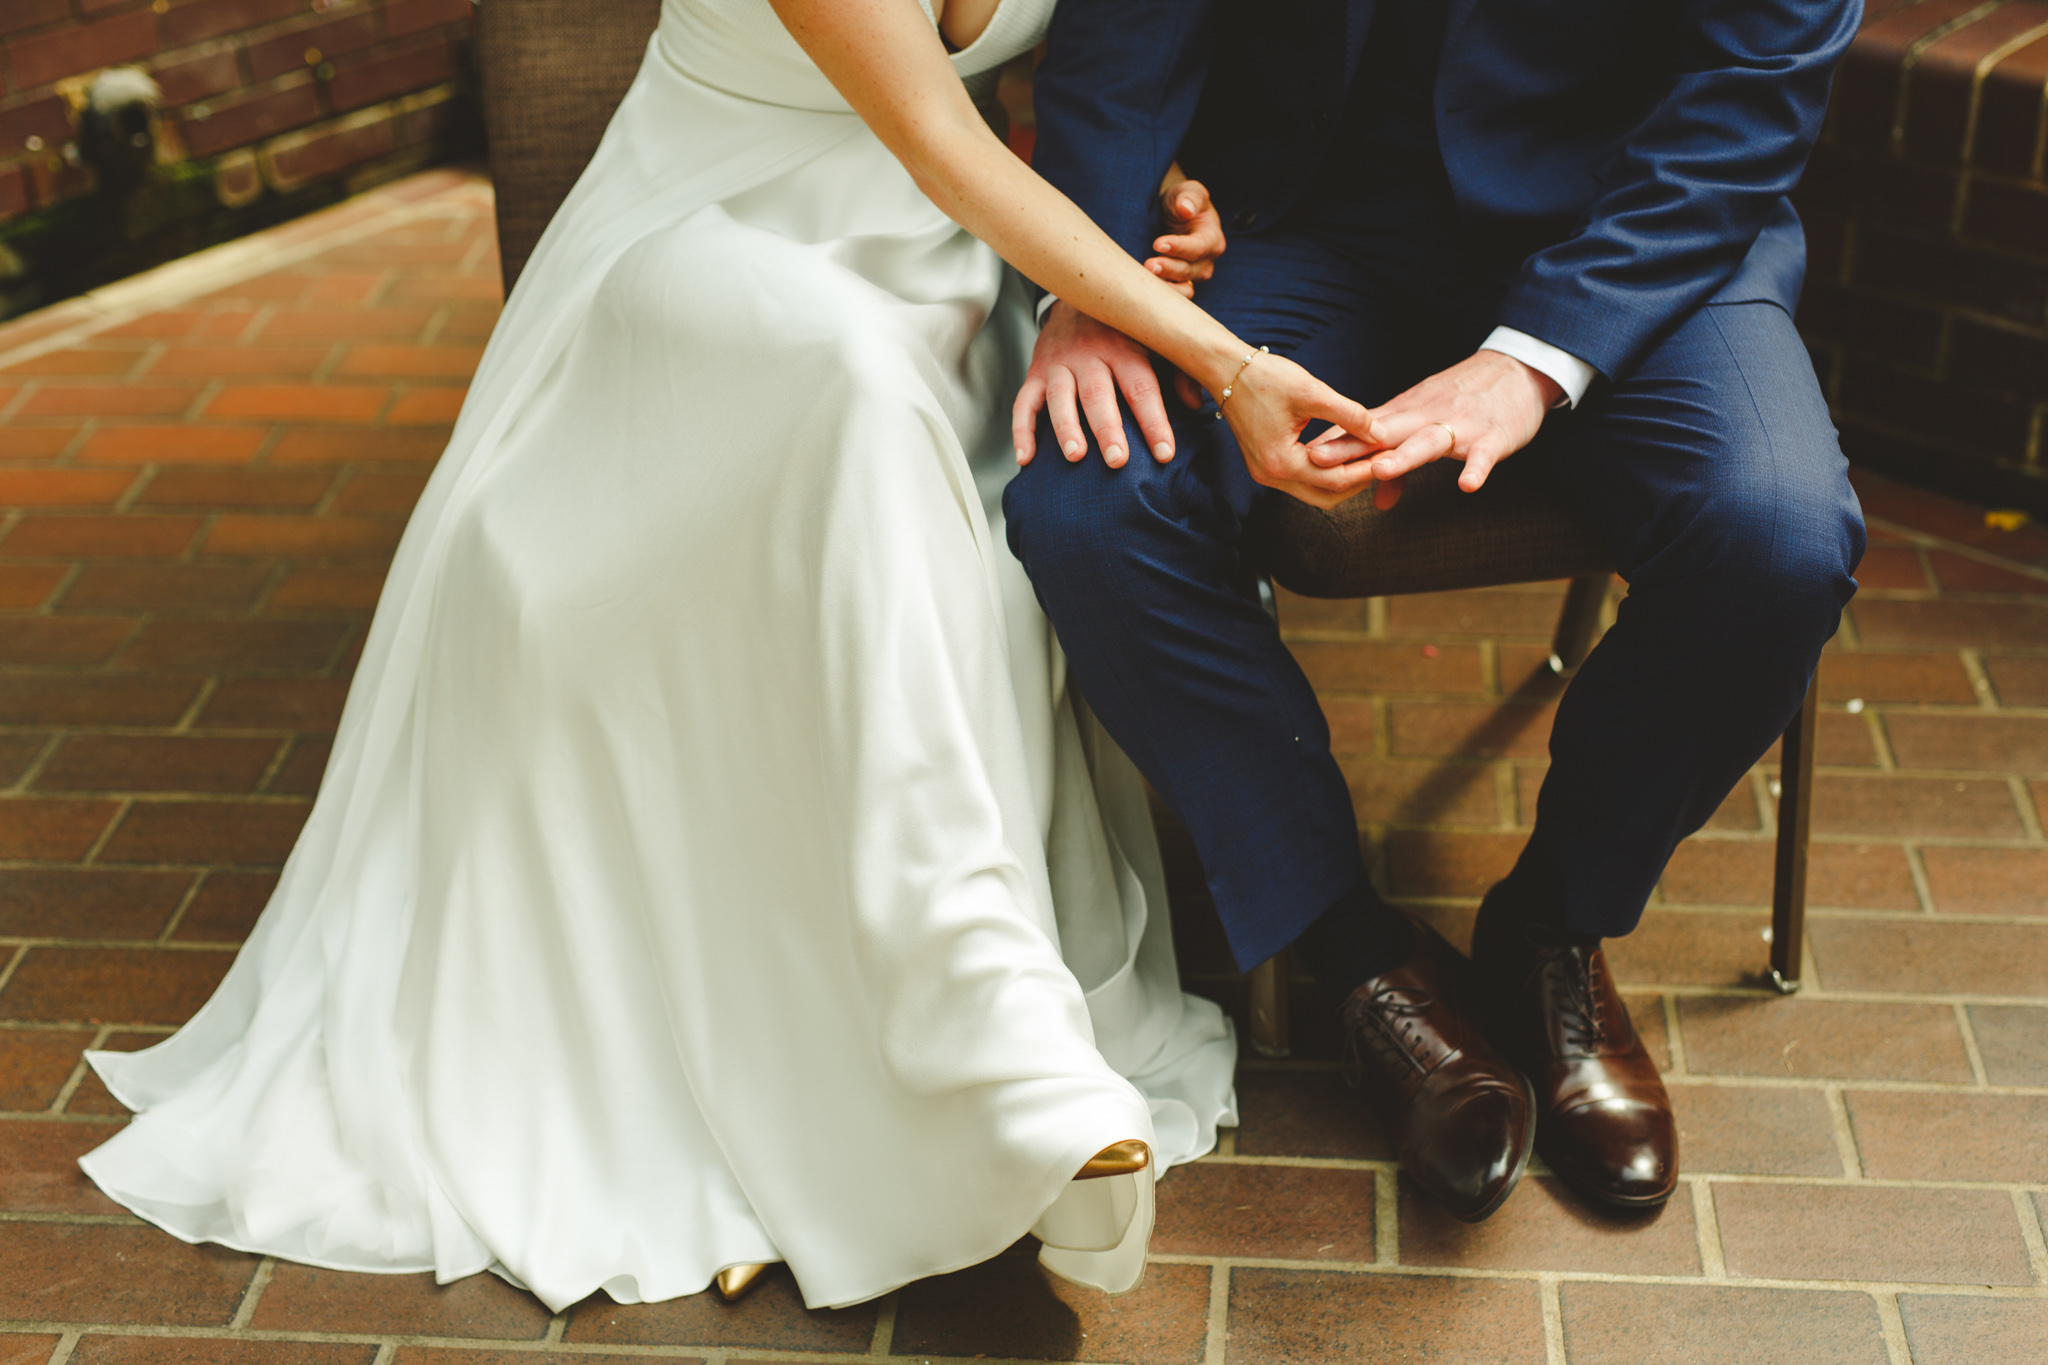 derbyshire-wedding-photographer-videographer-camera-hannah-26.jpg